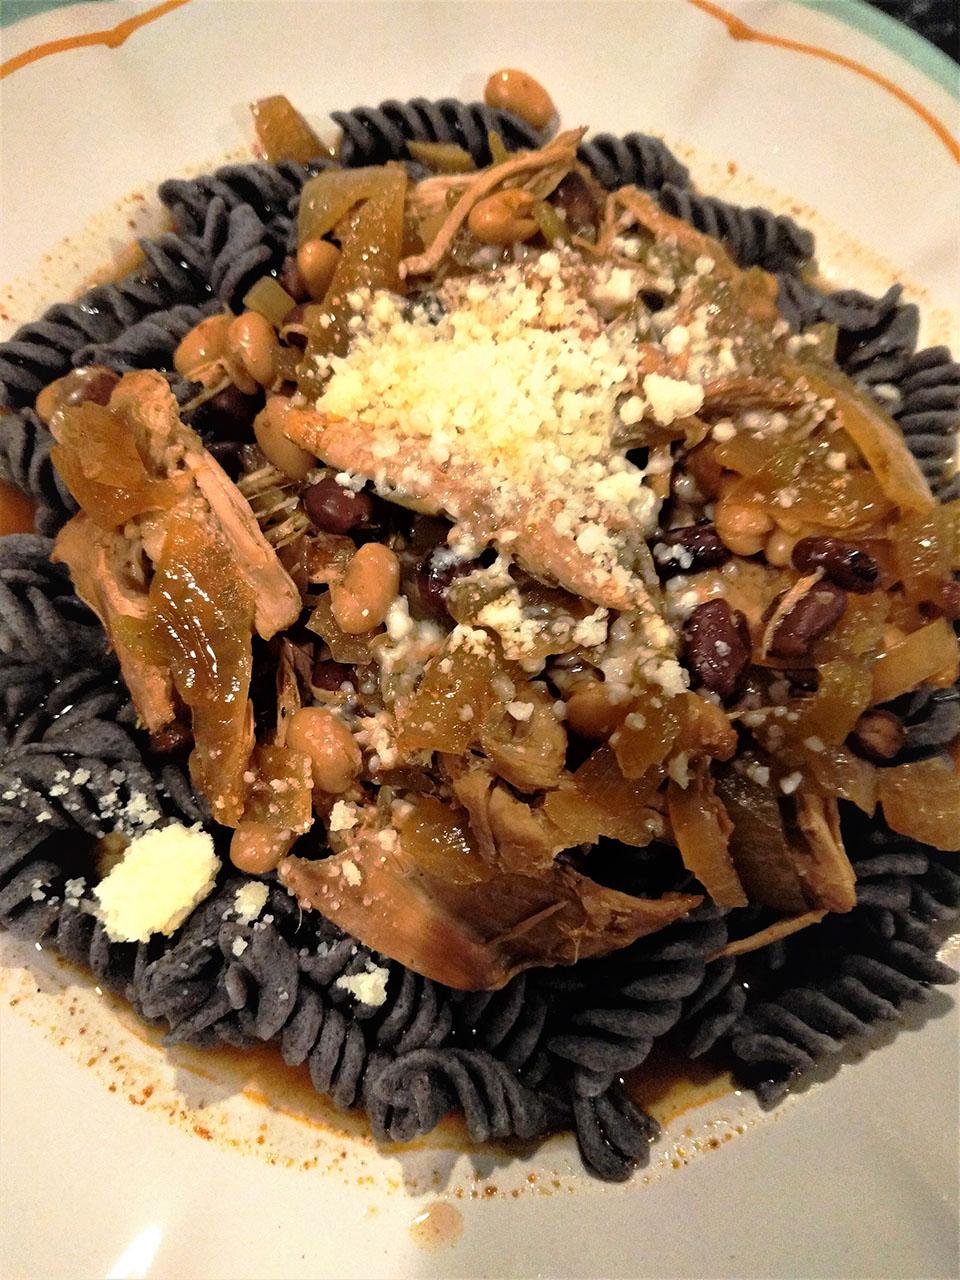 Slow Cooker Chicken Thighs over High-Fiber Black Bean Pasta